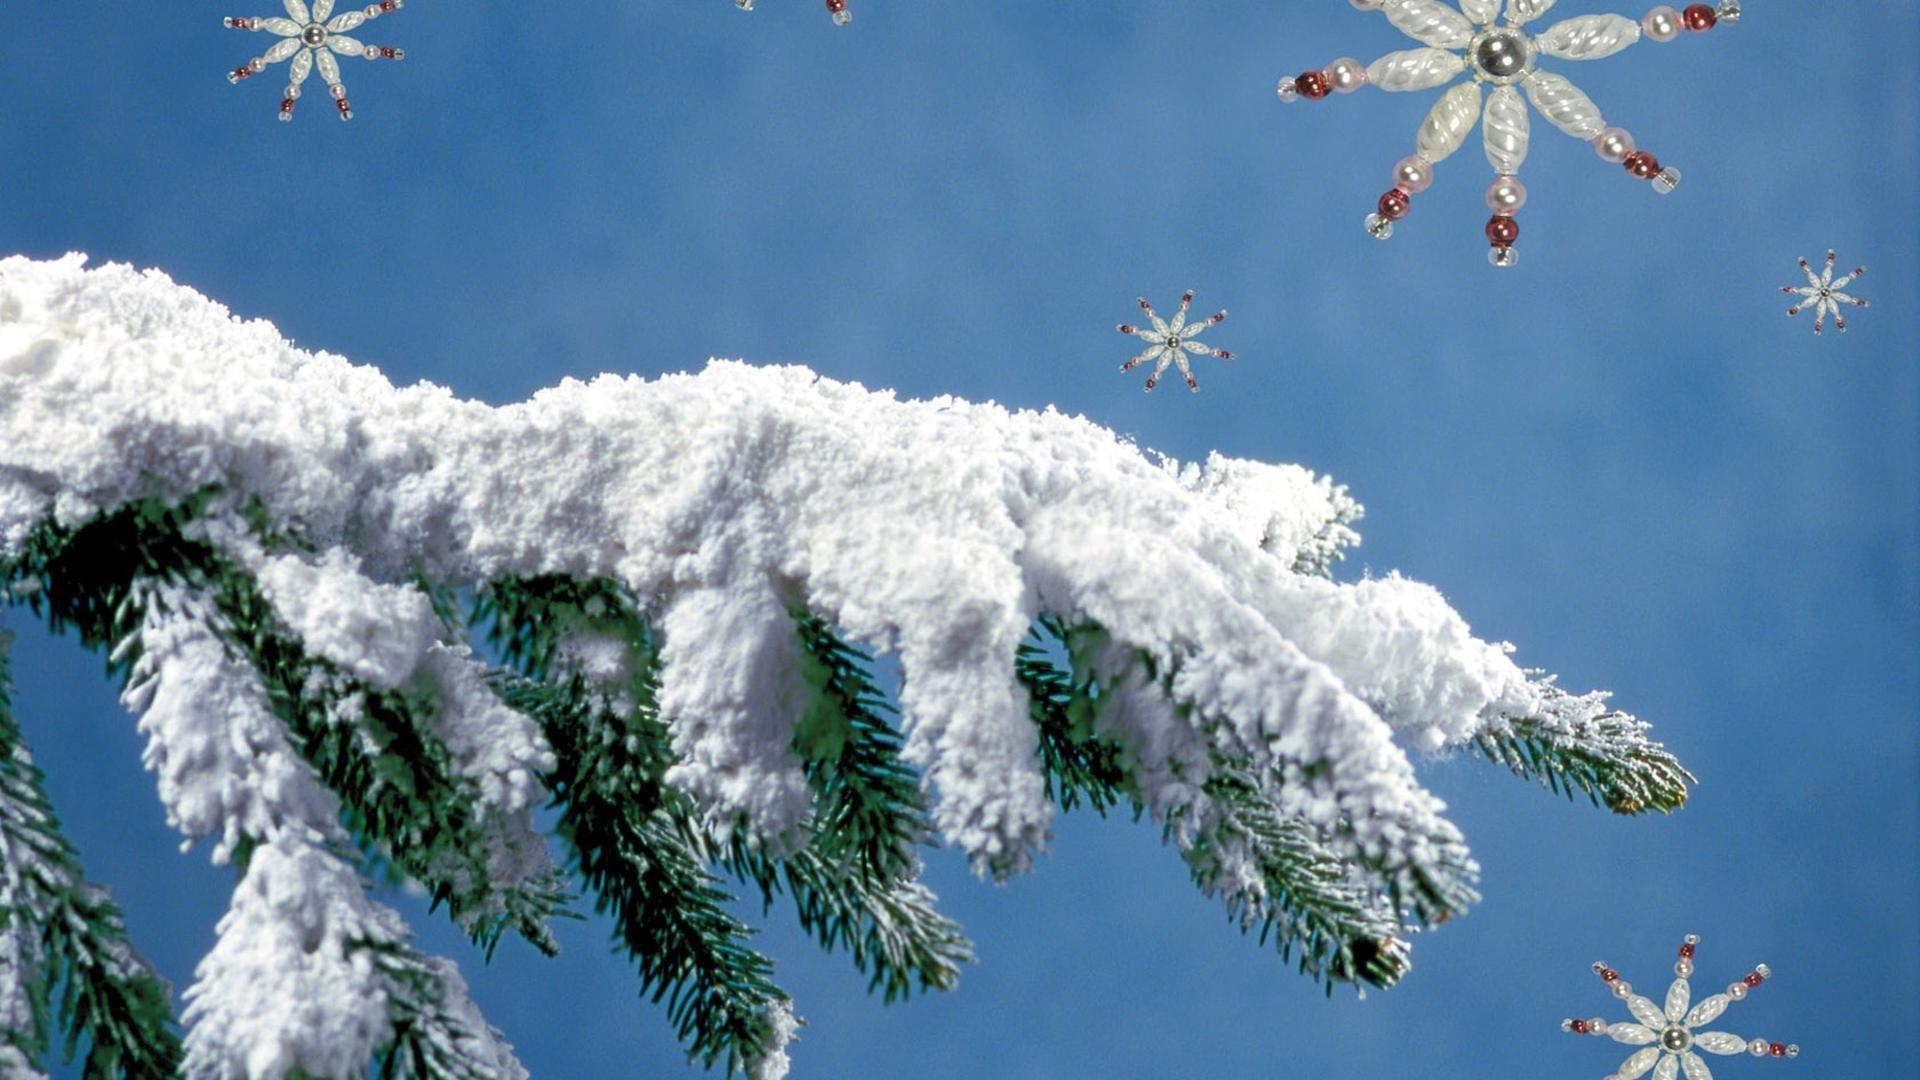 Winter christmas desktop backgrounds